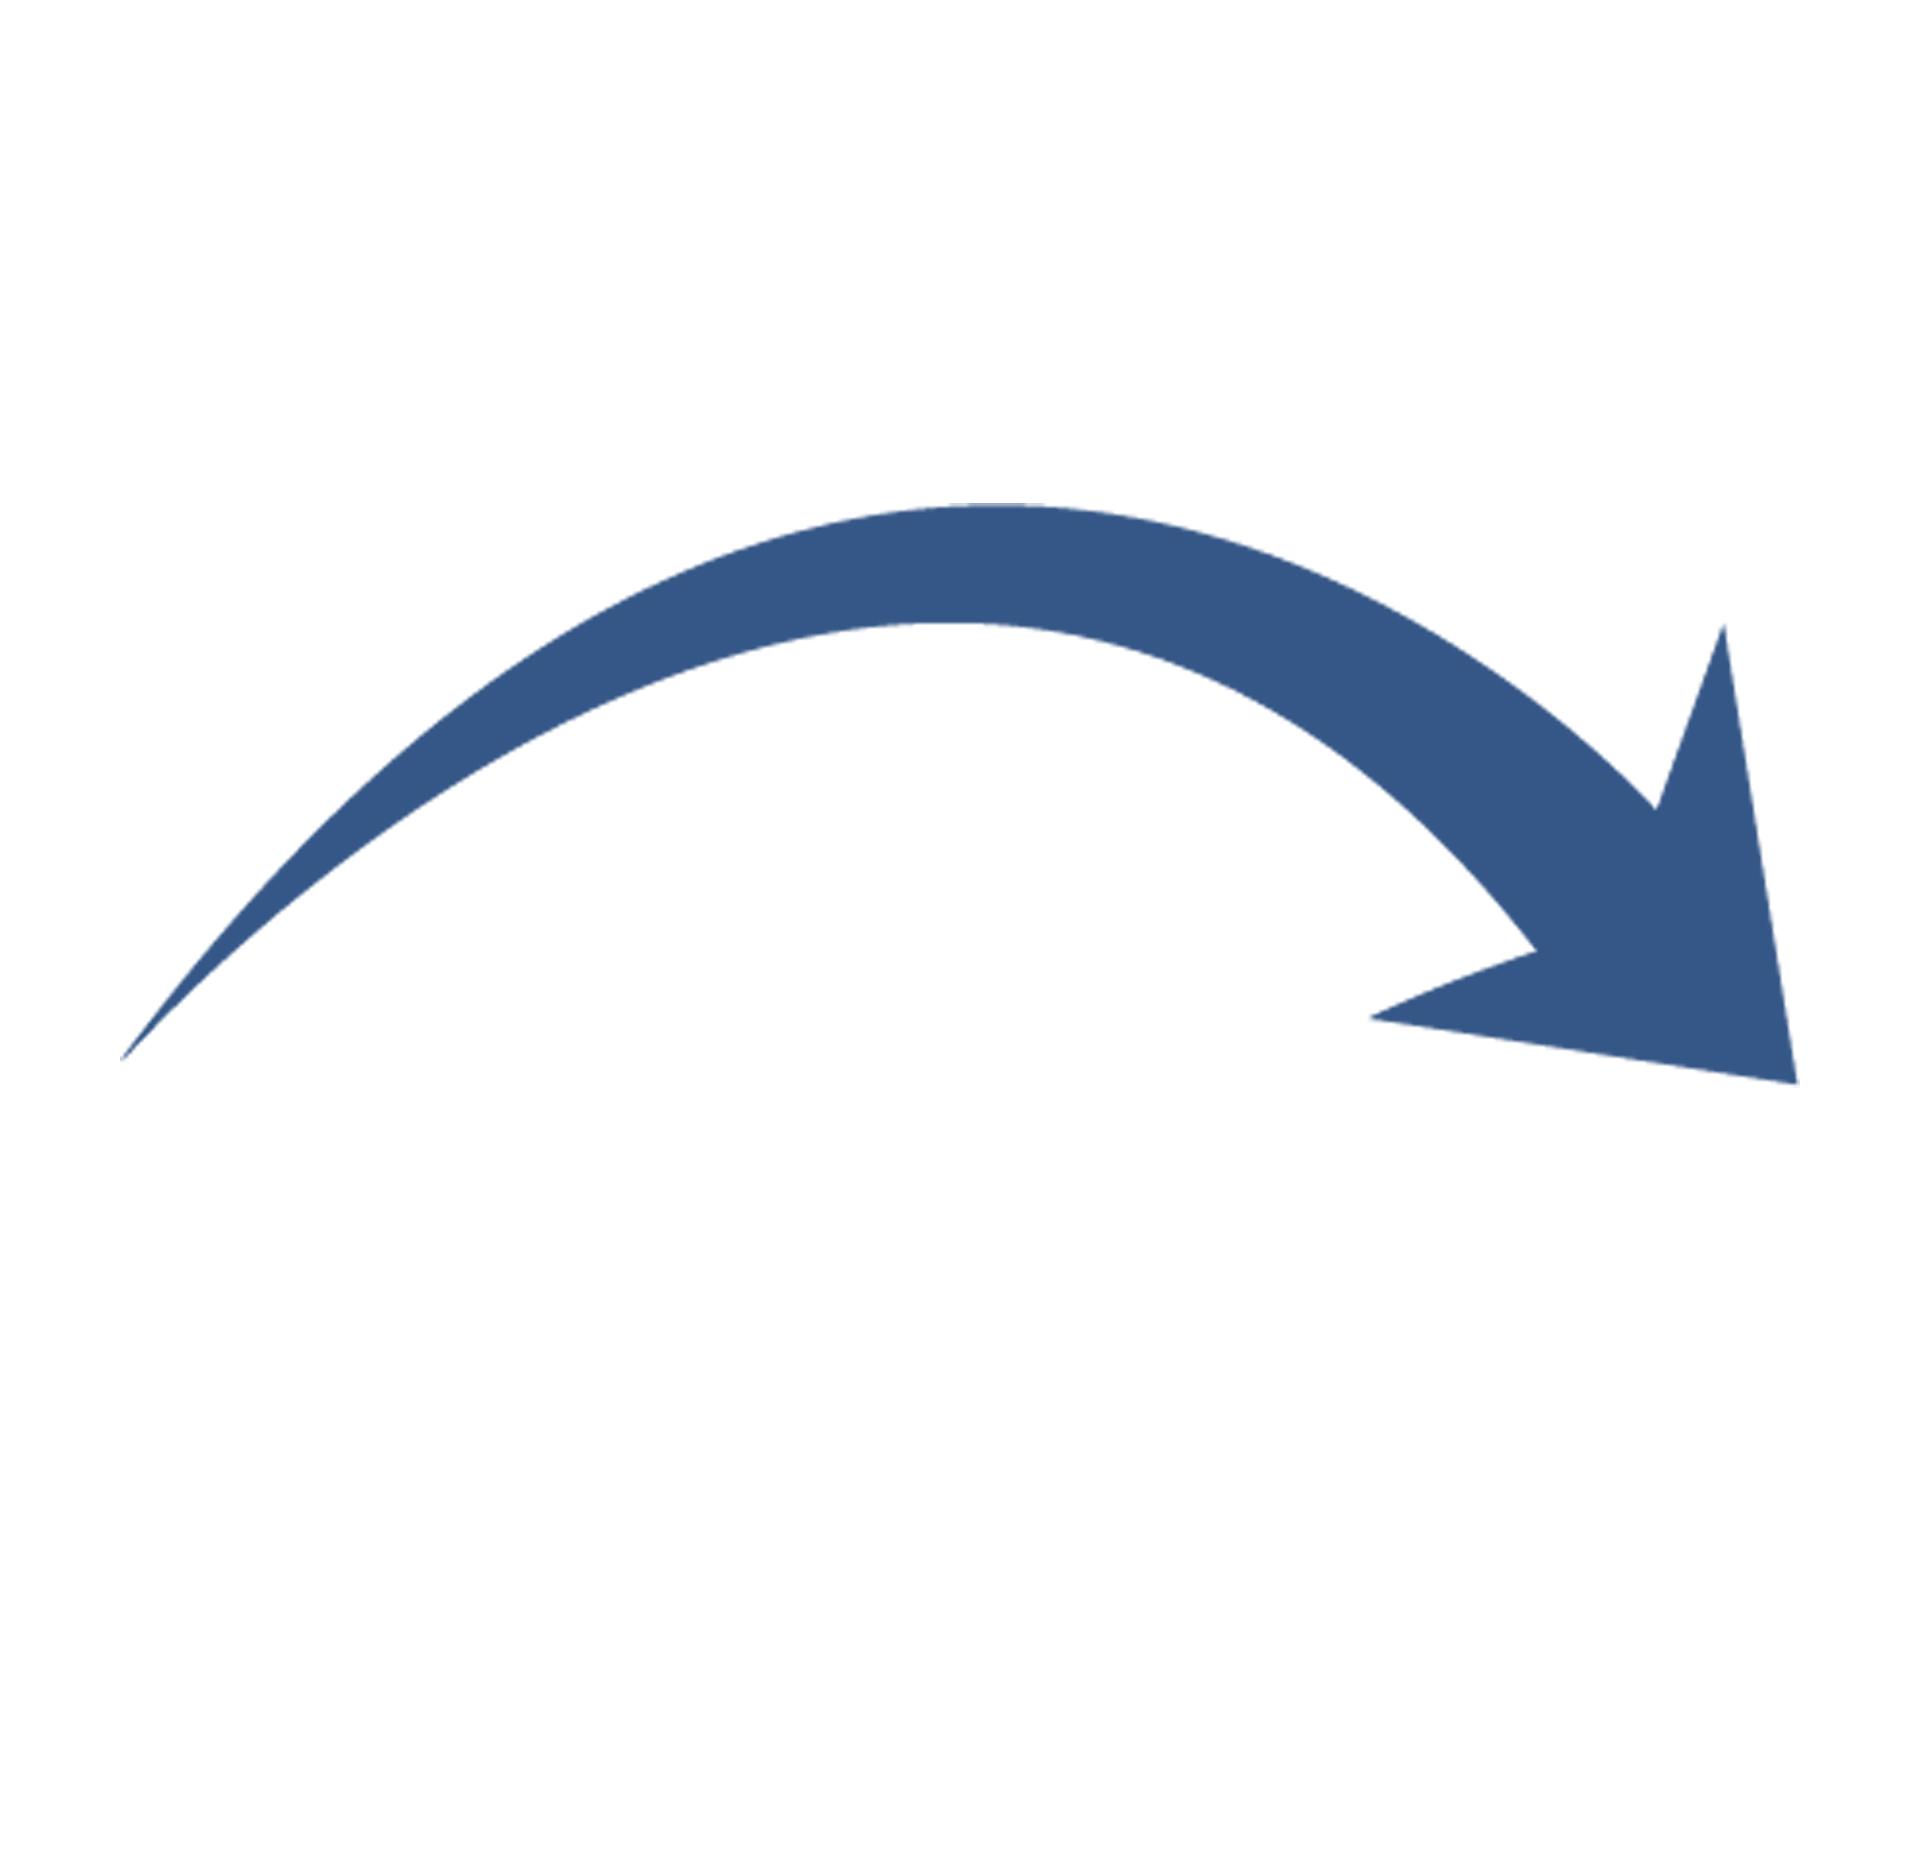 1920x1866 Round Line Arrows Clipart